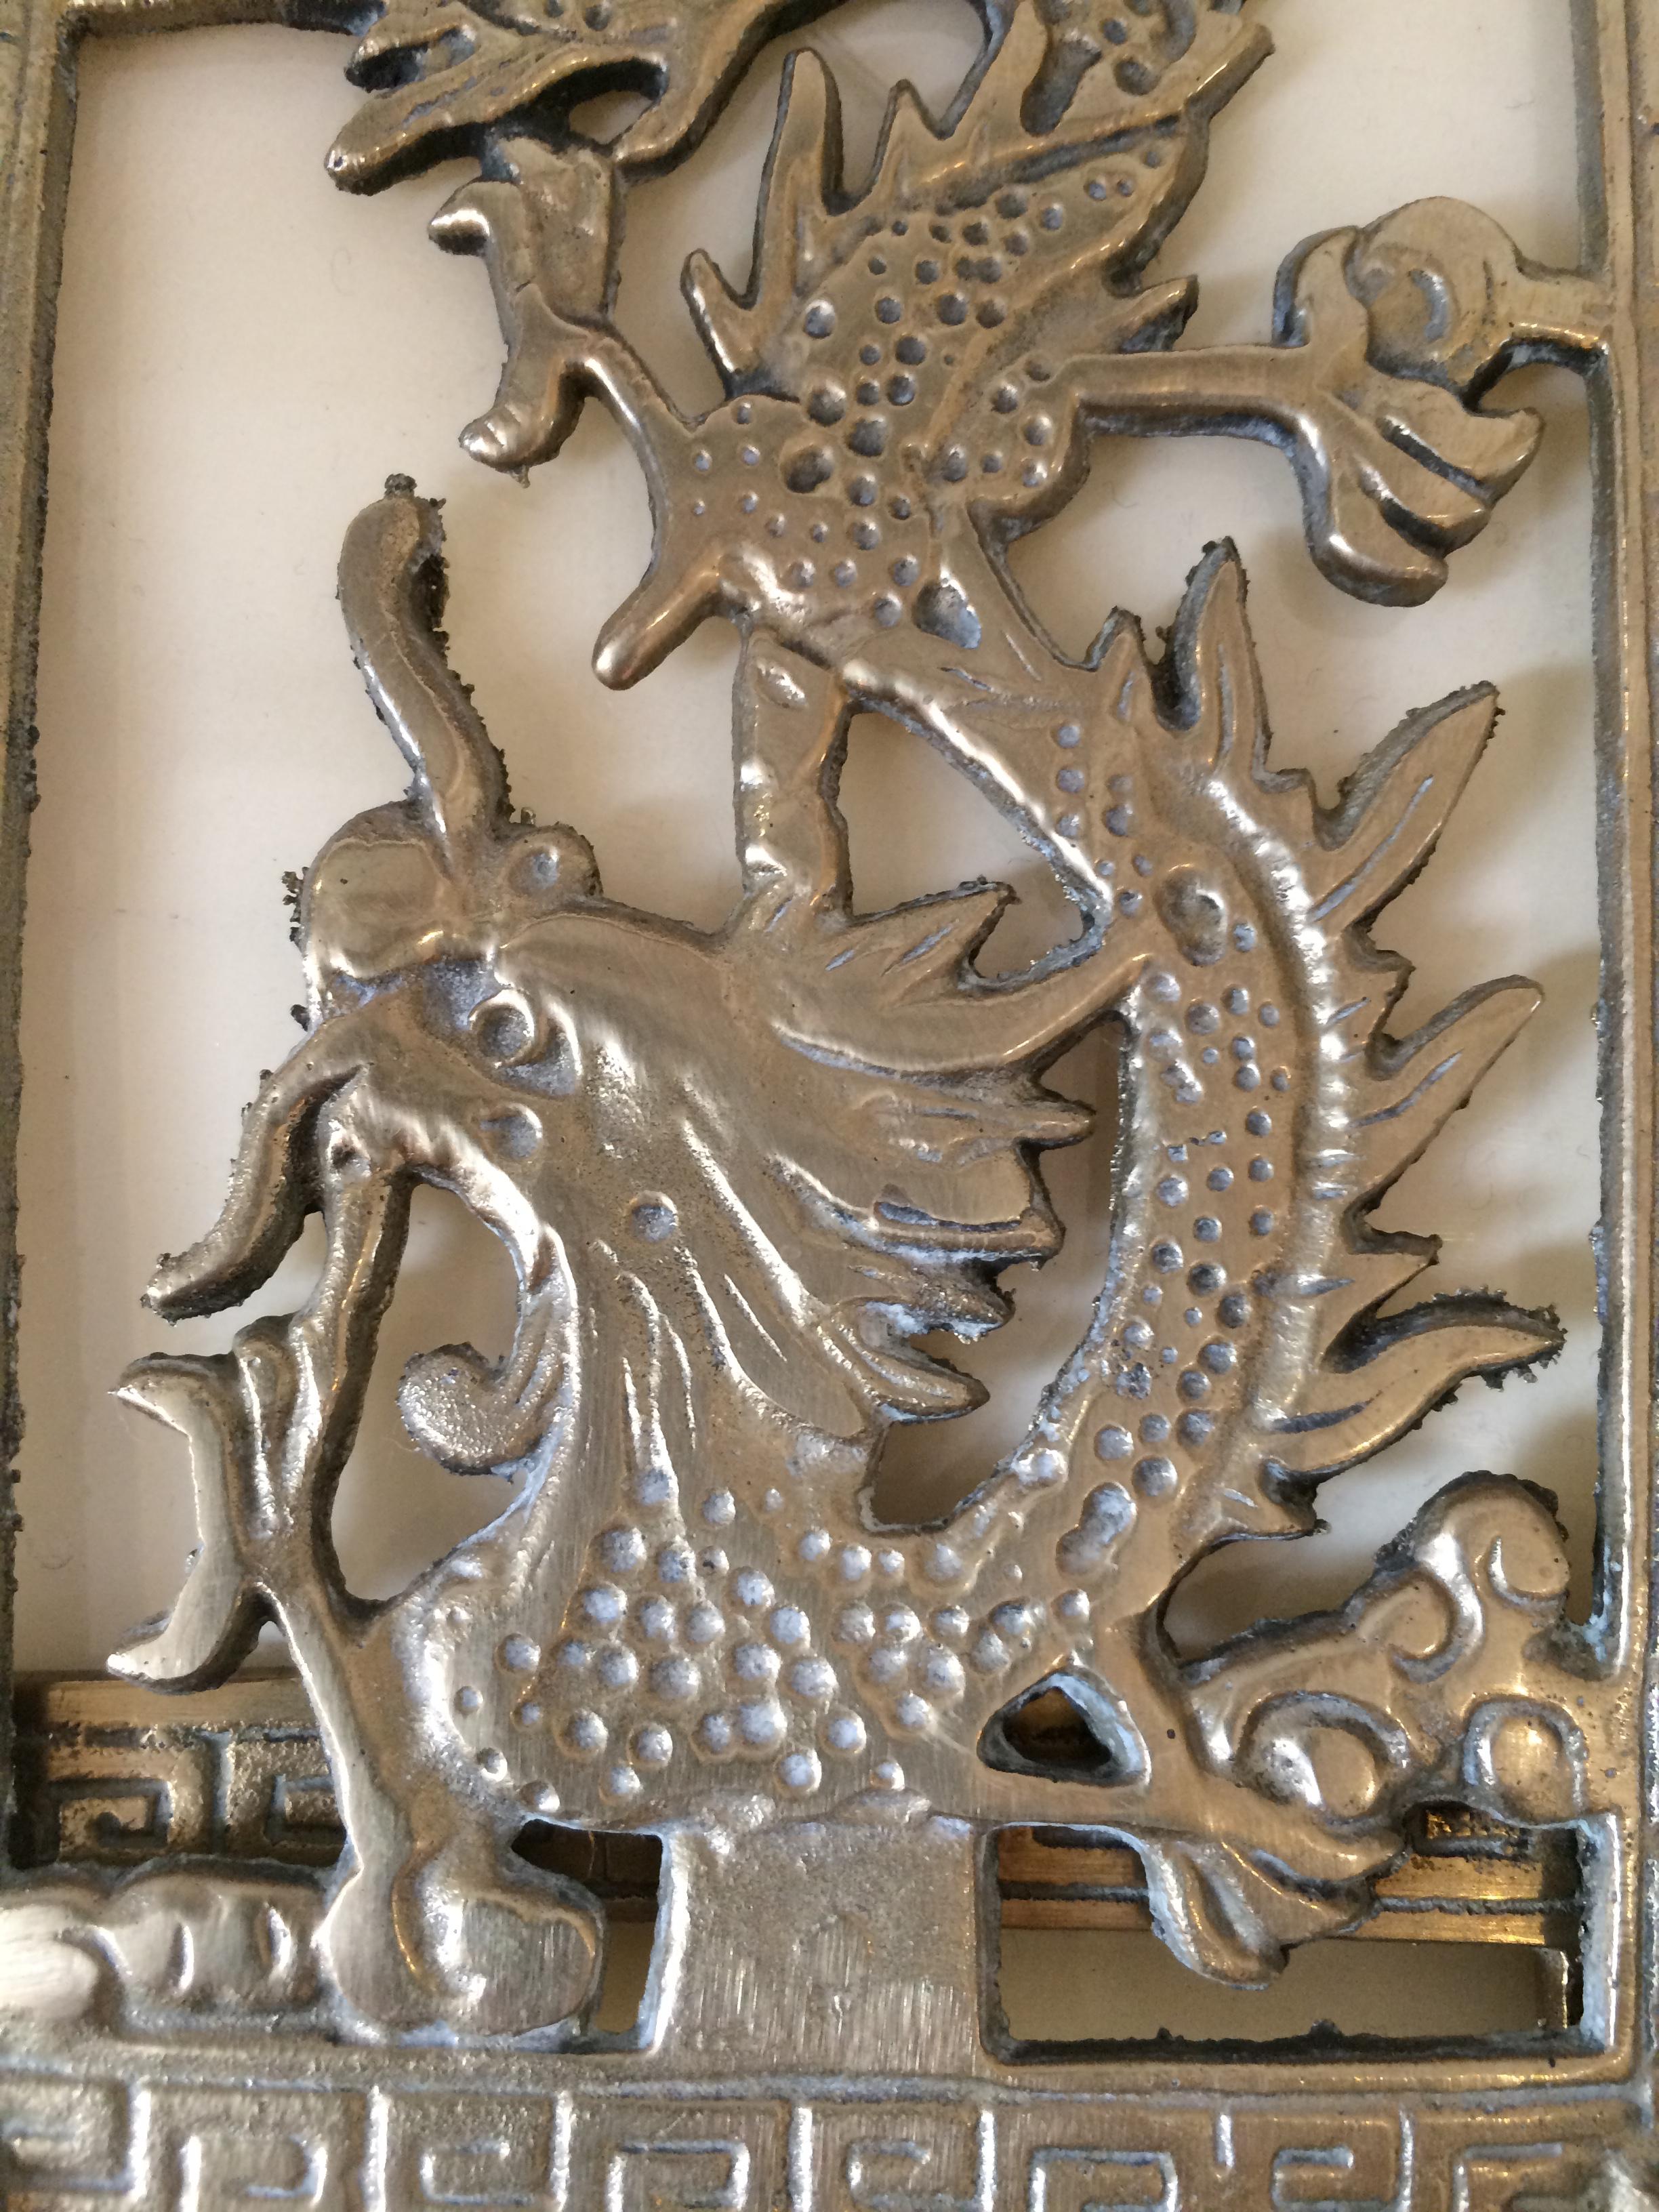 Bedroom Key Dragon Age